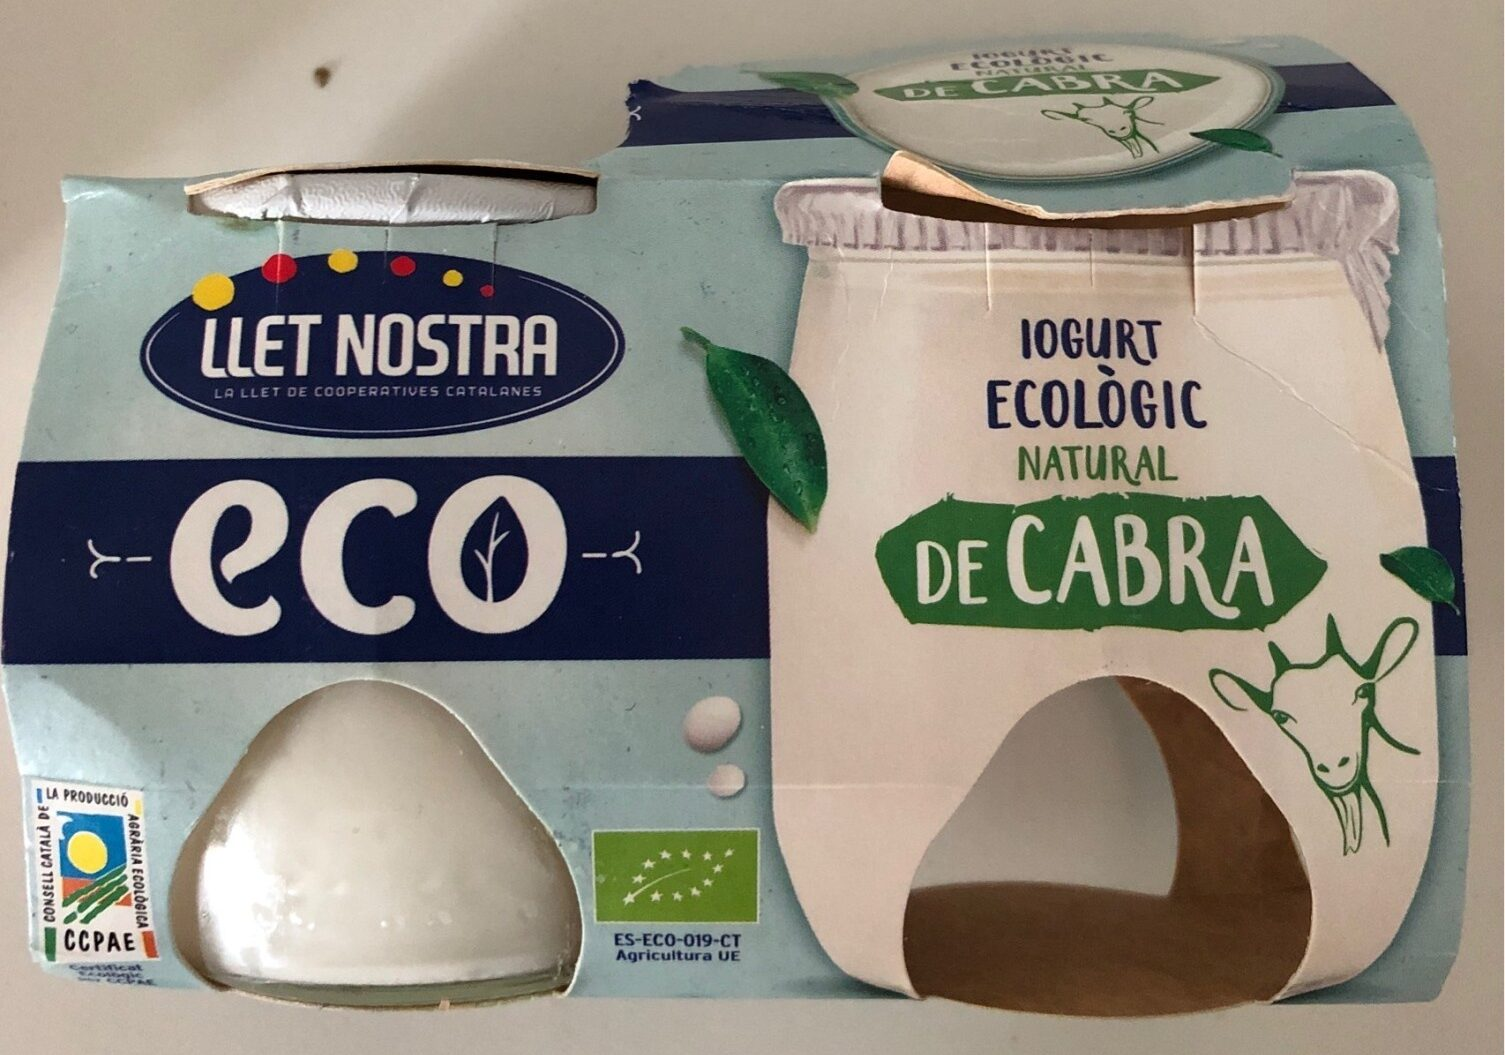 Iogurt ecológico natural de cabra - Product - es